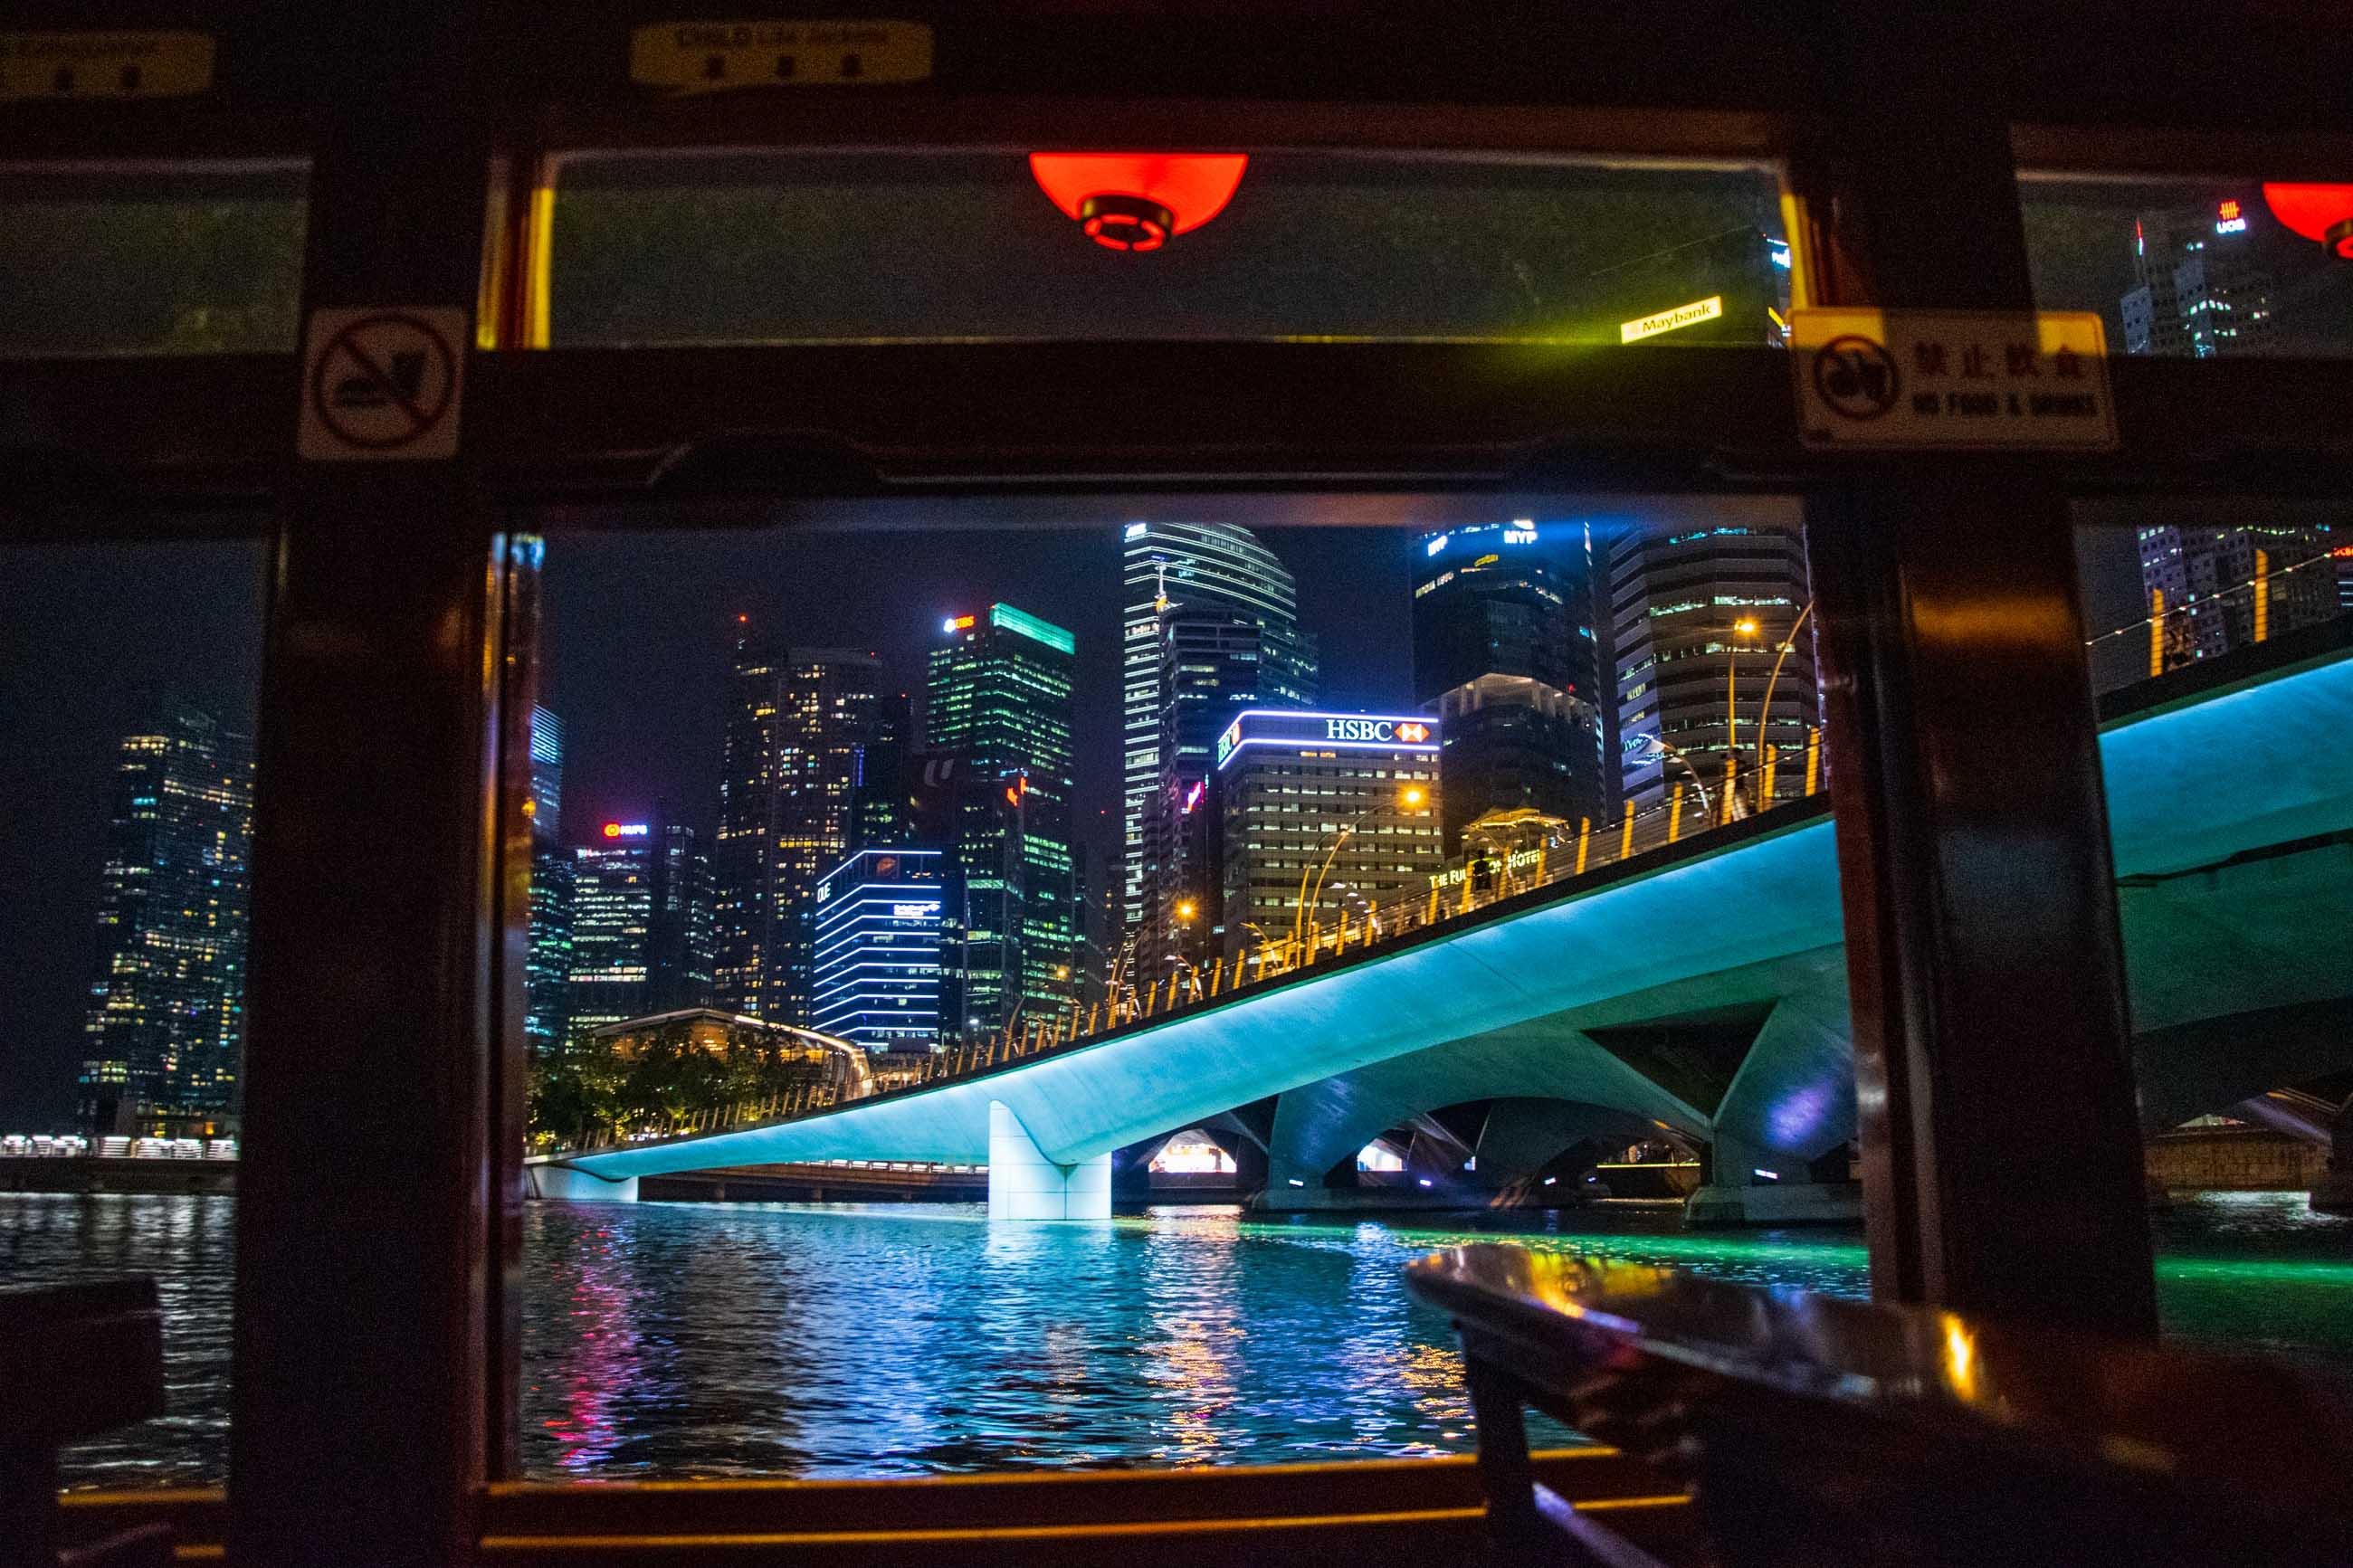 https://bubo.sk/uploads/galleries/5061/adam_zahorsky_singapur_dsc_0763.jpg